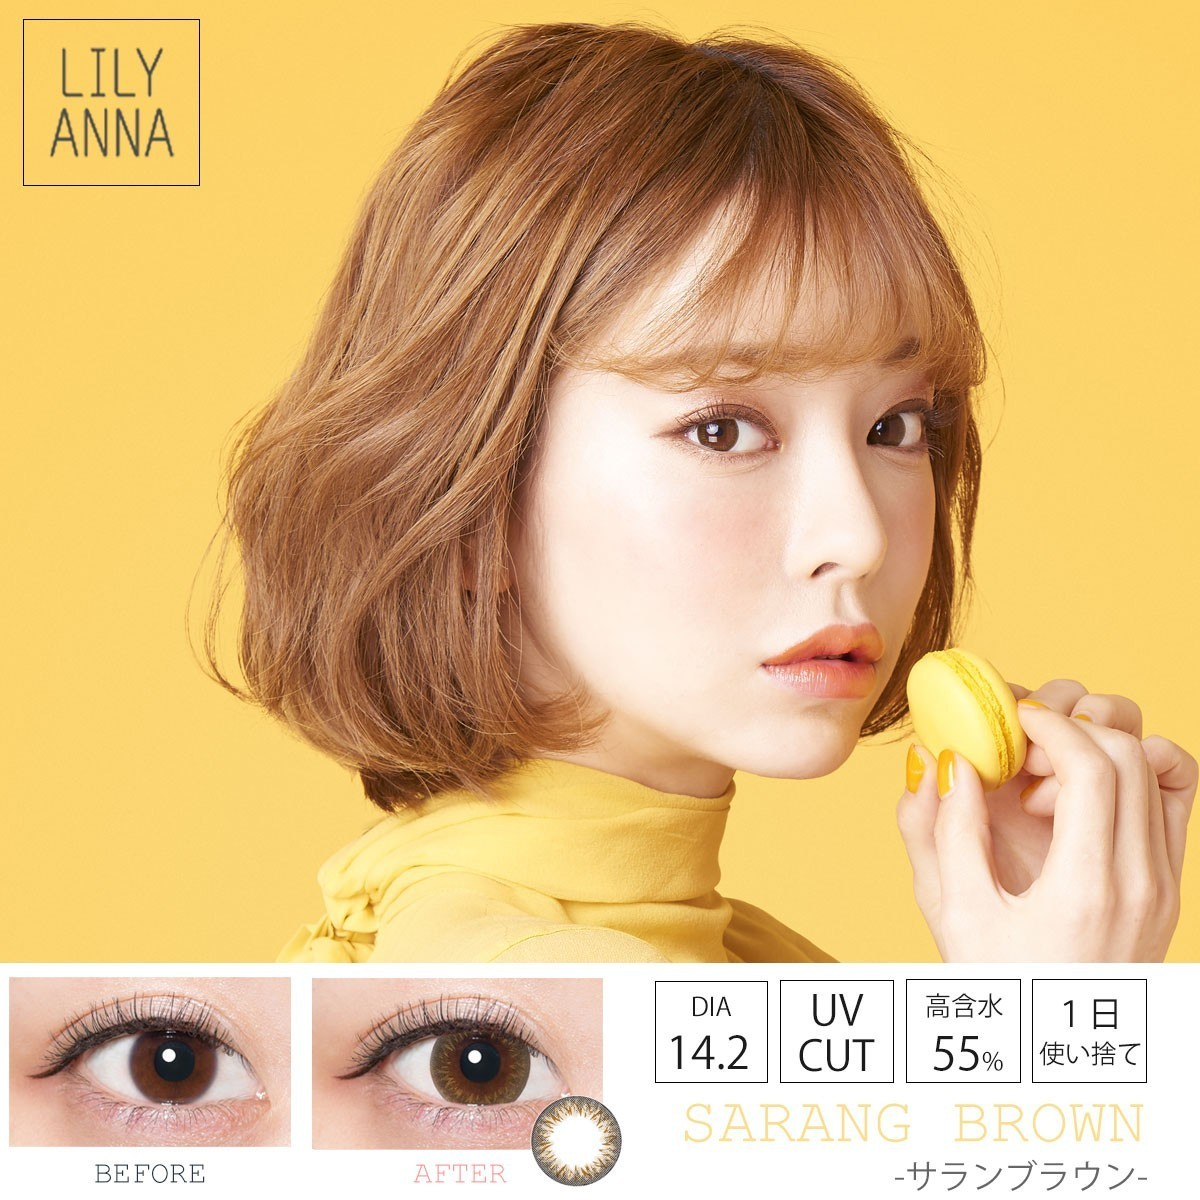 PIA株式会社 LILY ANNA(リリーアンナ) ワンデー カラー各種 10枚入りの商品画像|4